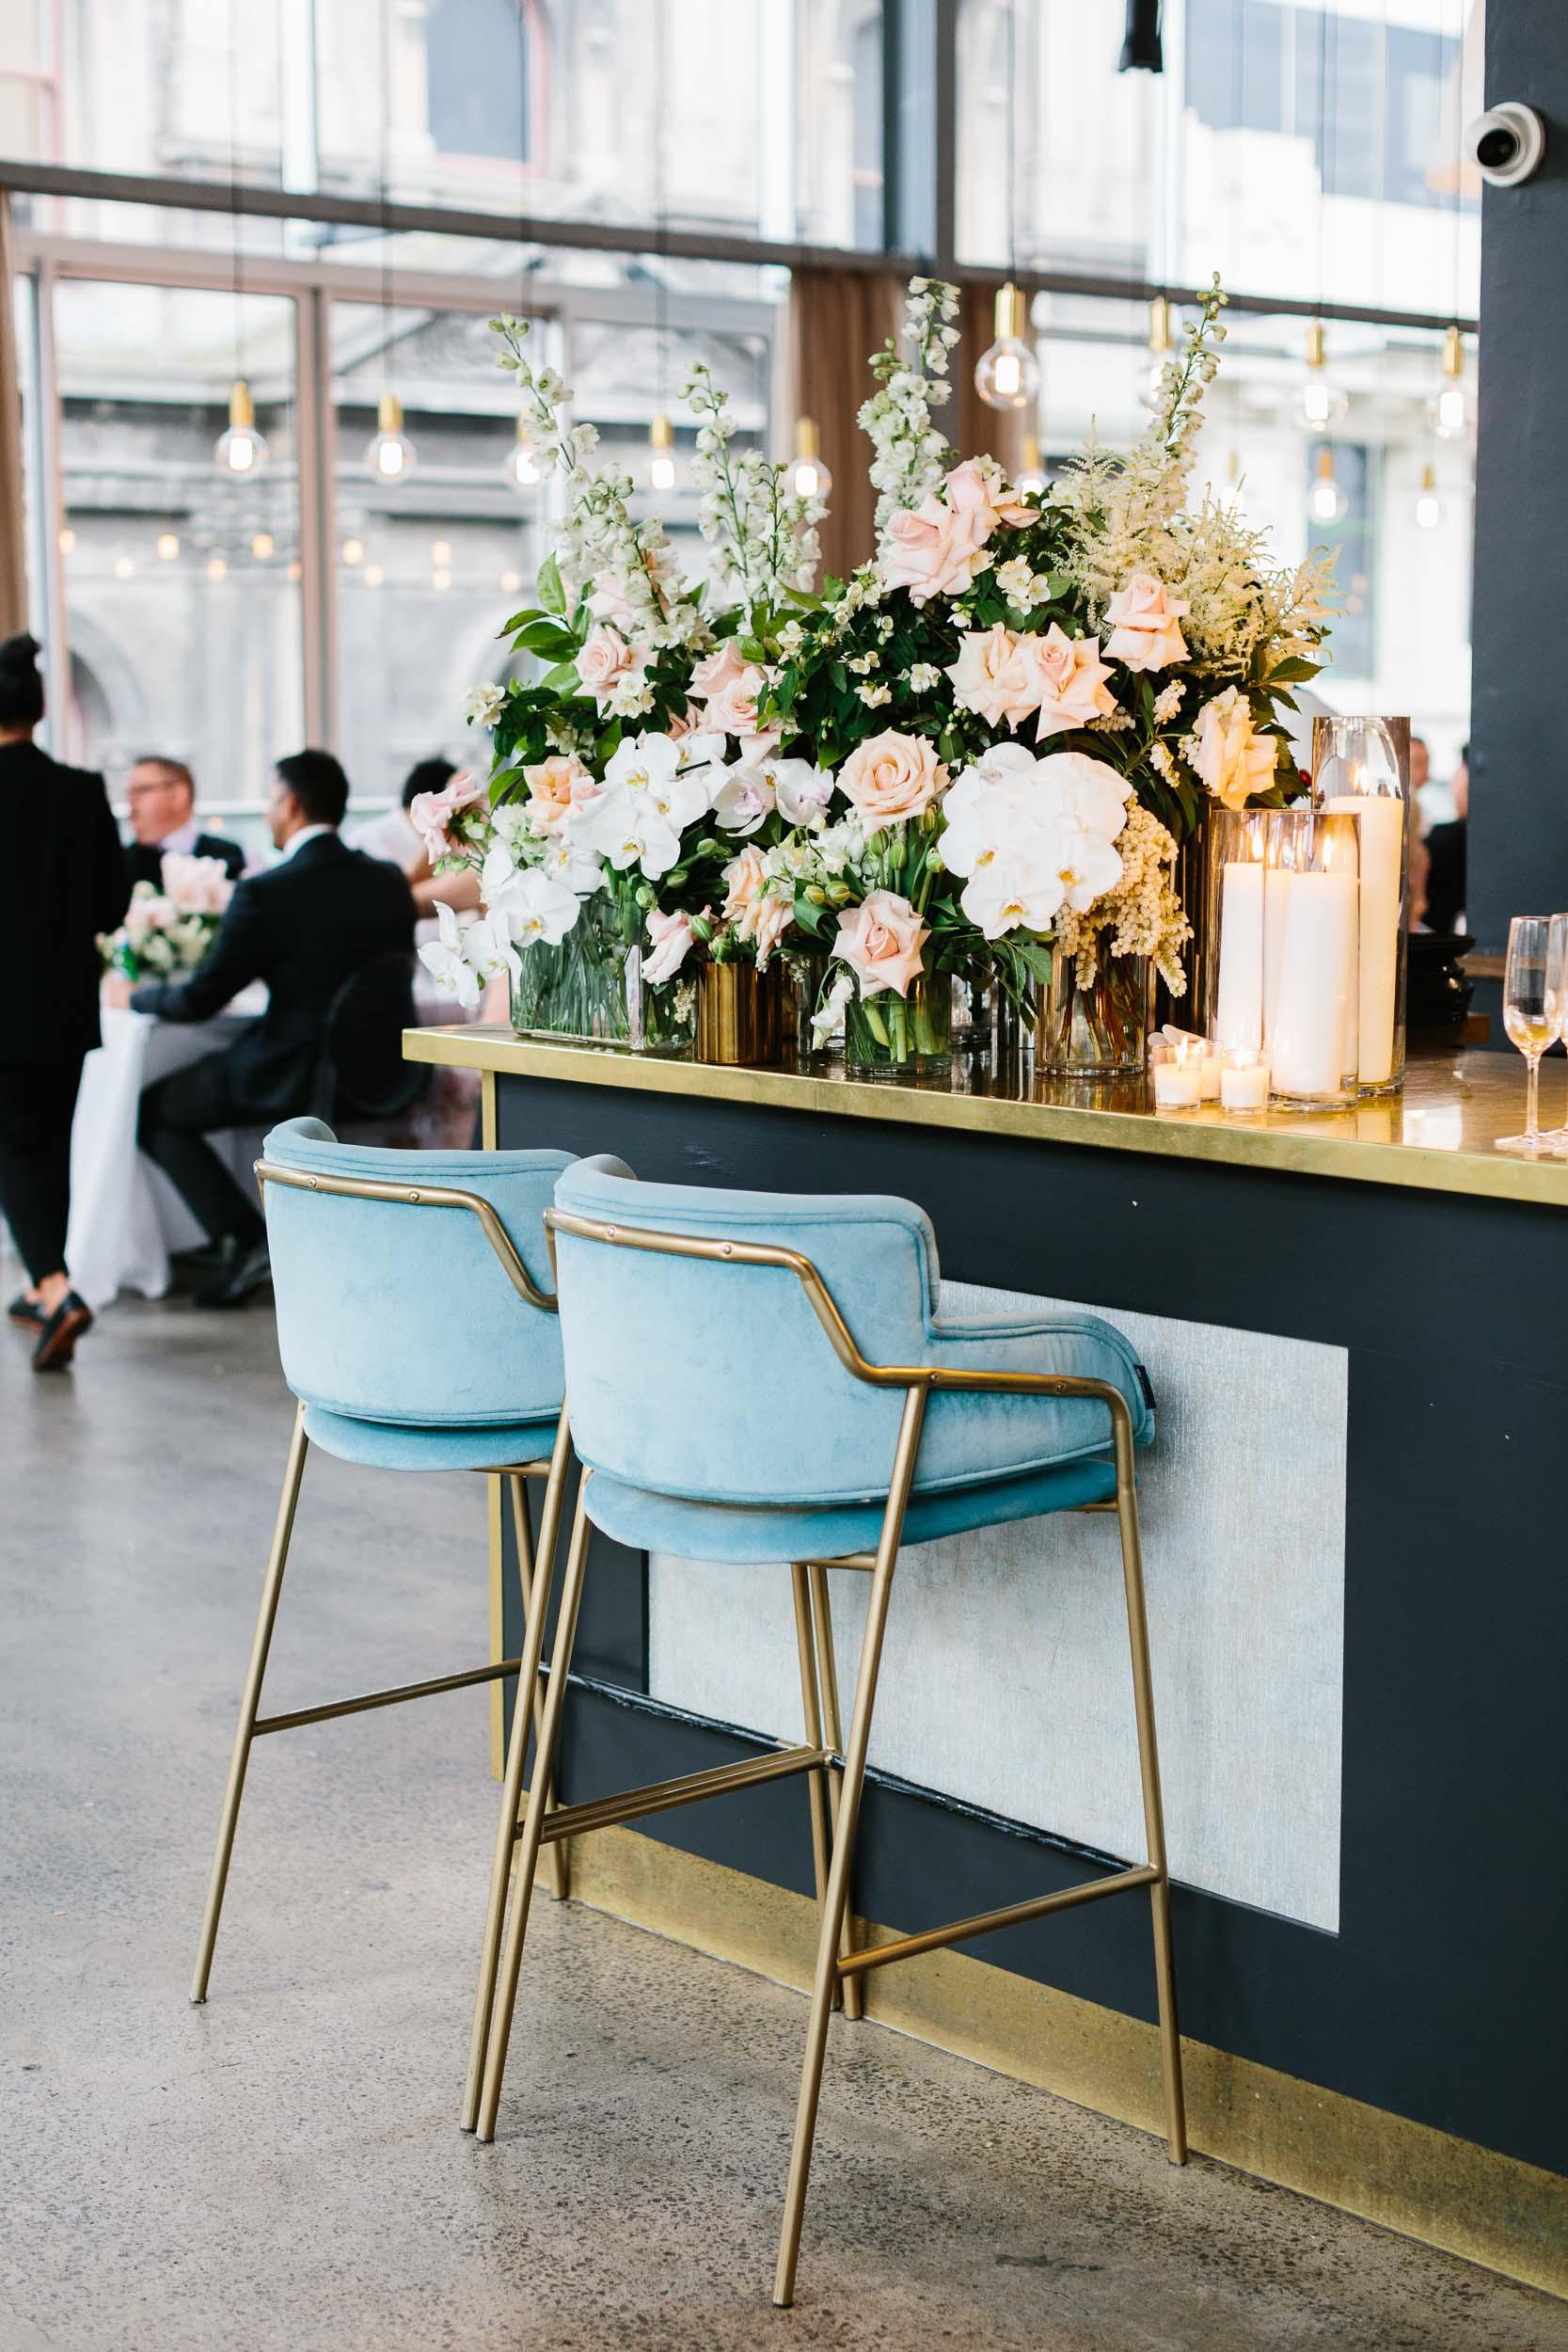 Kas-Richards-Wedding-Photographer-Melbourne-City-Wedding-Alto-Event-Space-Jane-Hill-Bridal-Gown-59.jpg